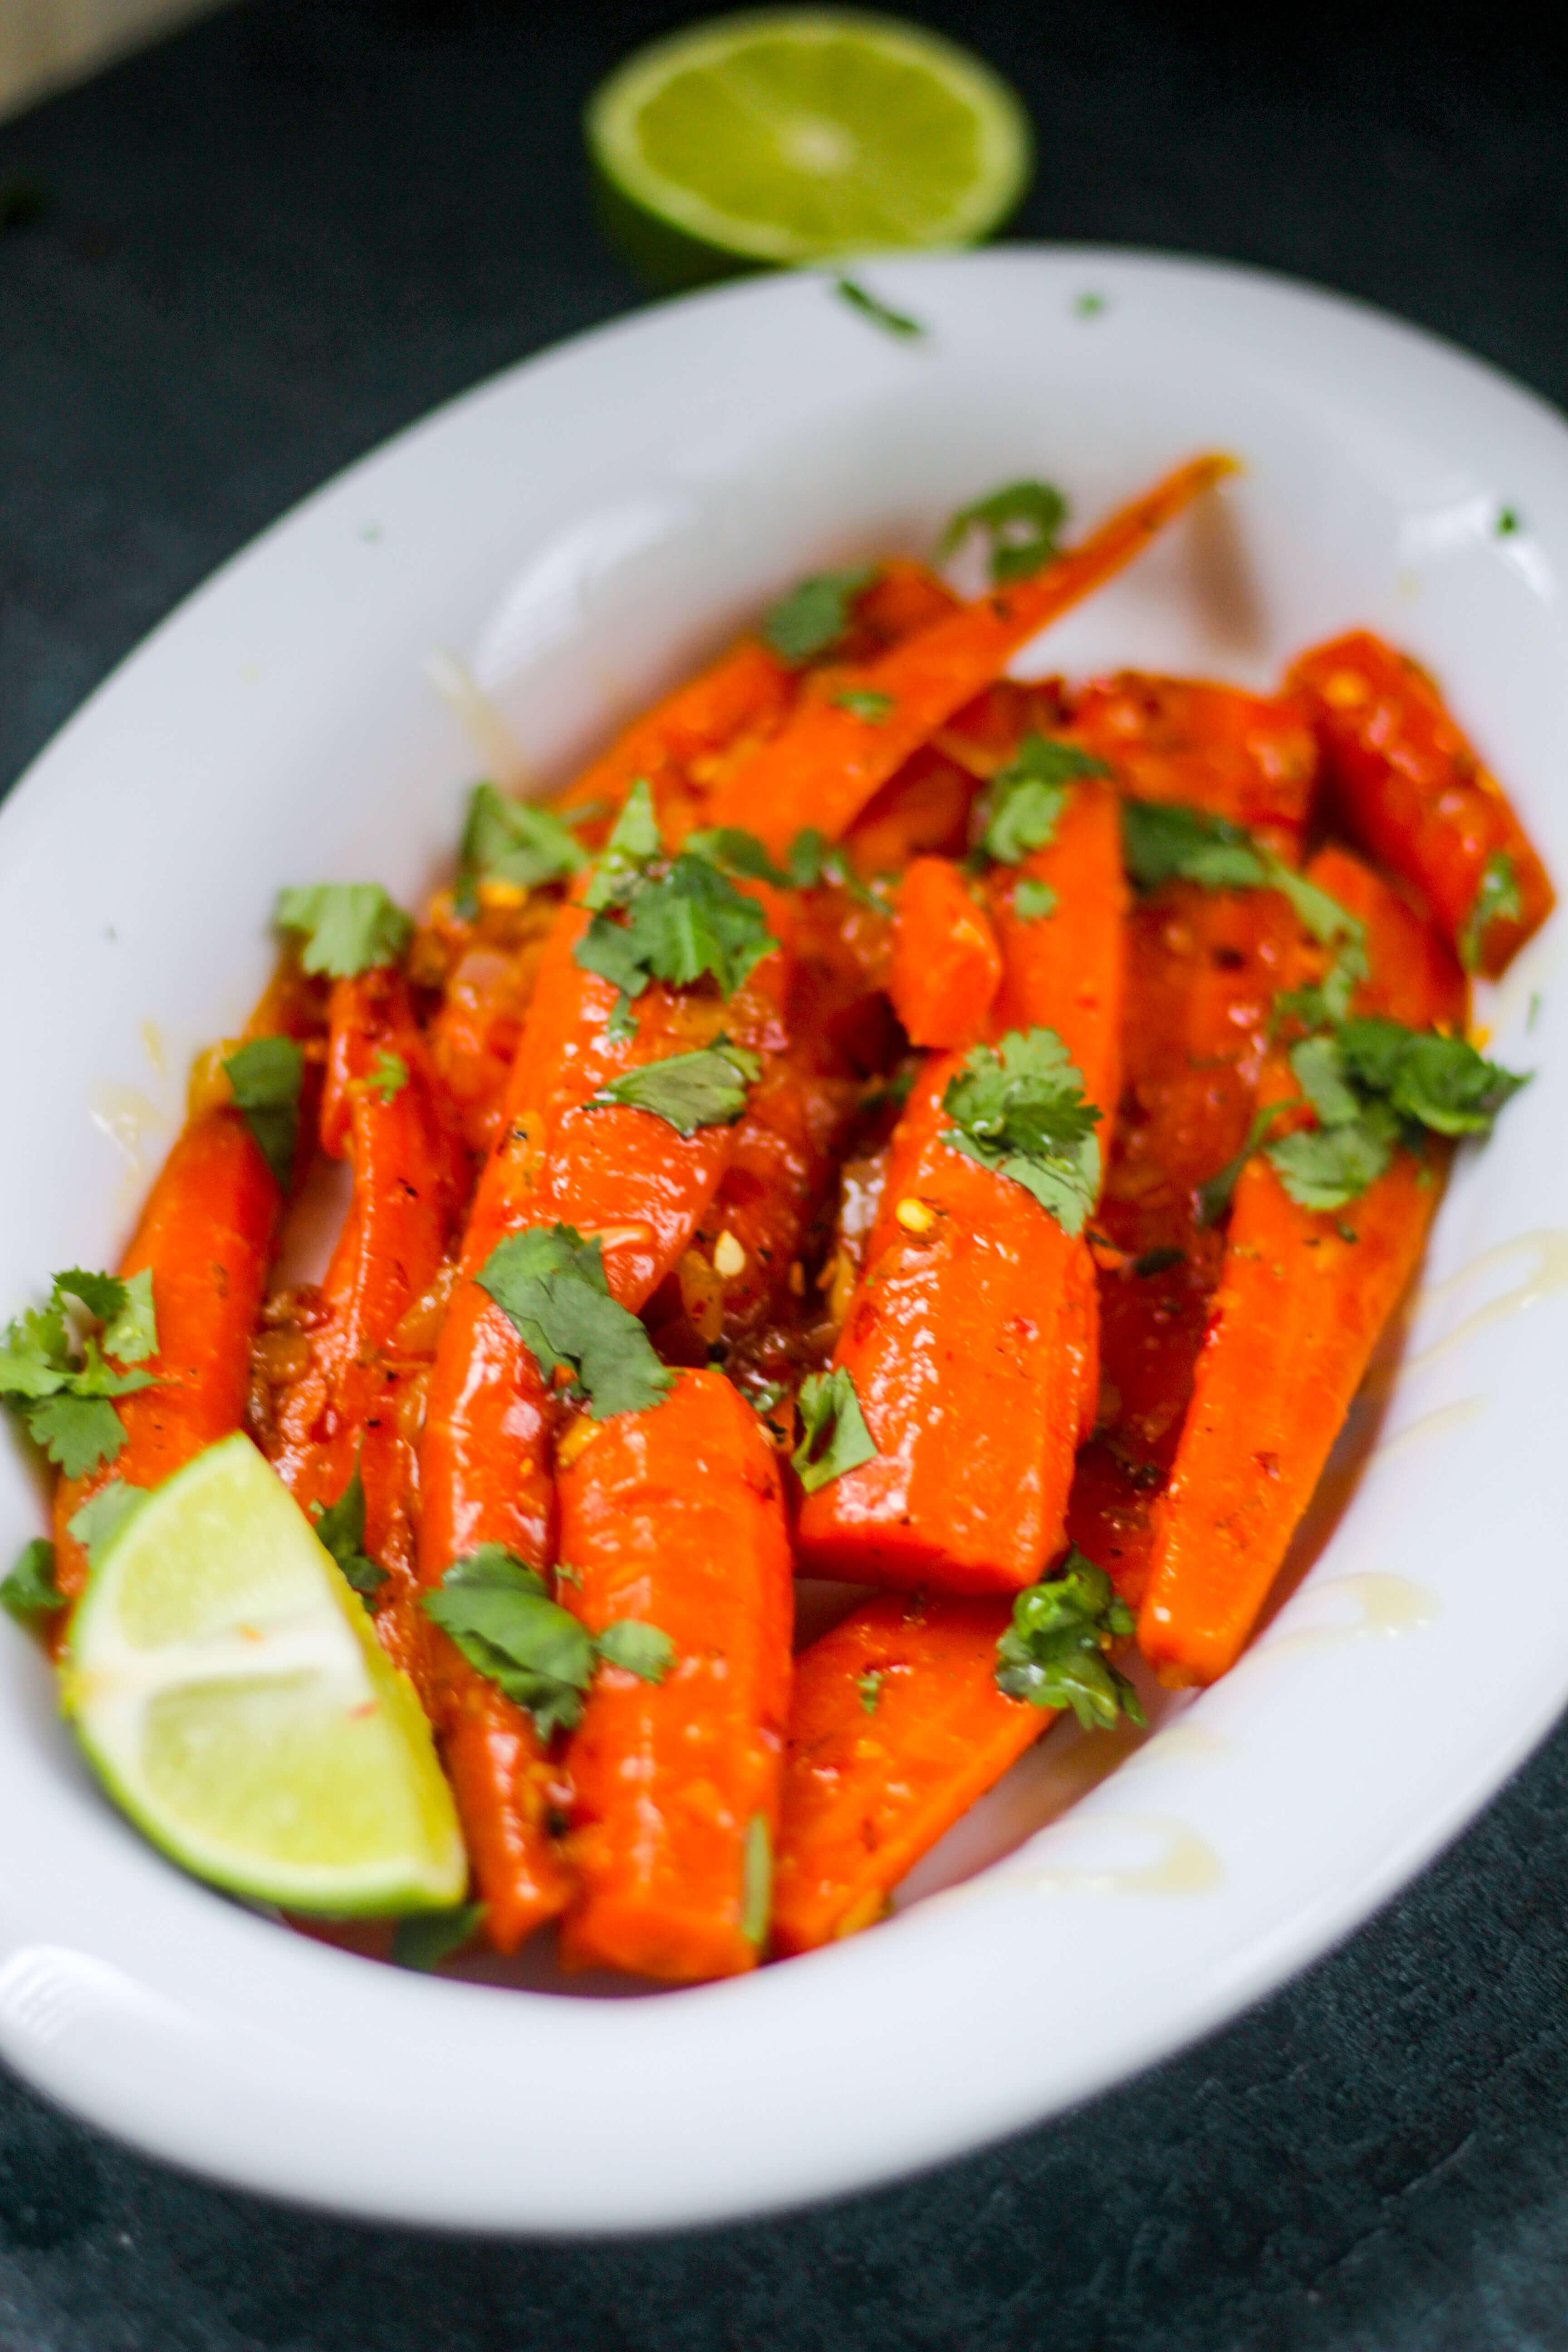 Margarita Braised Carrots